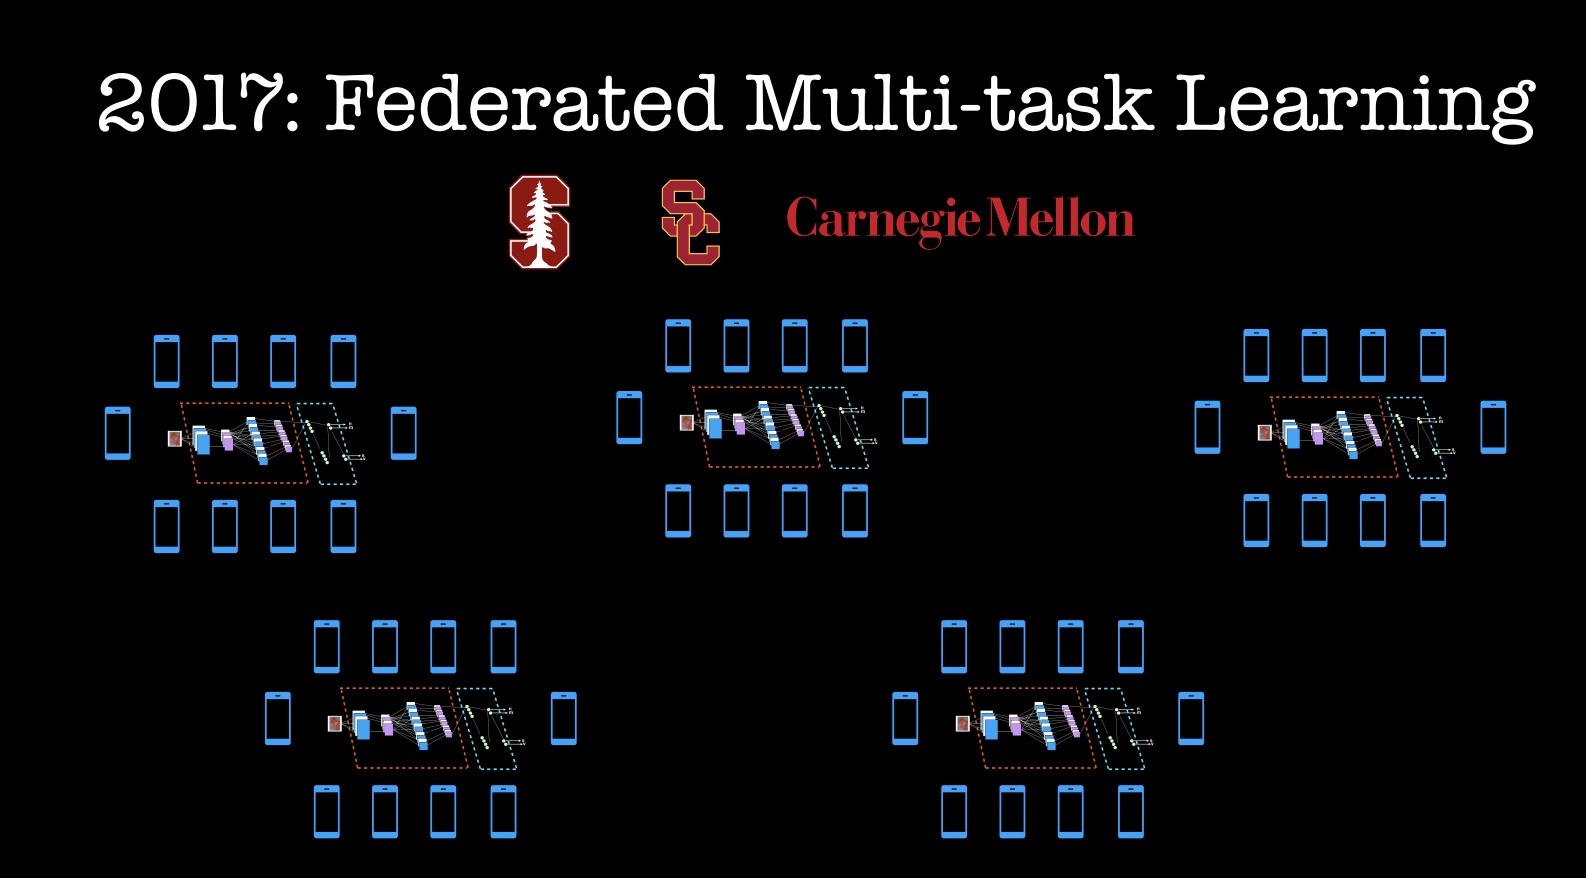 2017 Federated Multi-task Learning